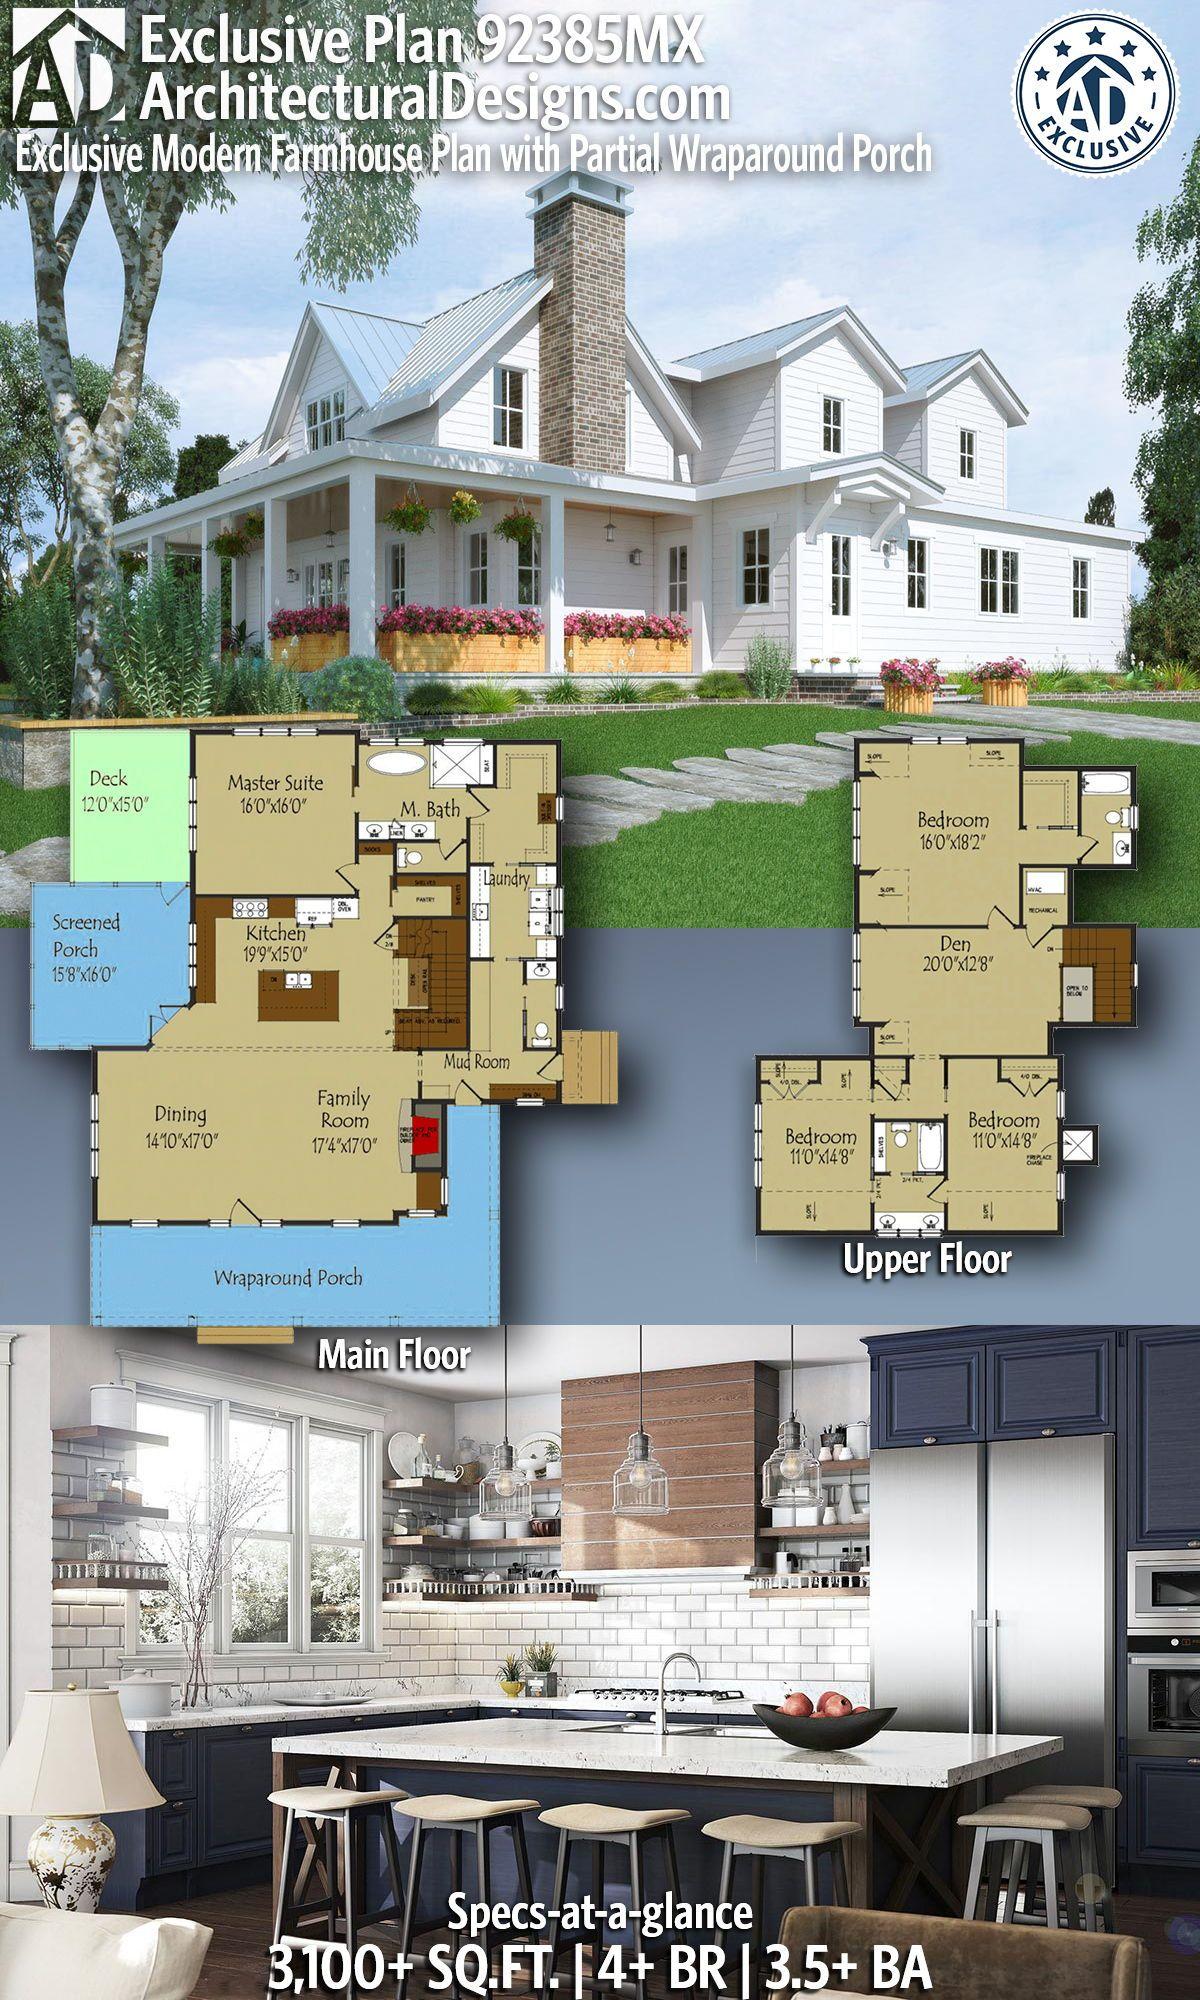 Plan 92385mx Exclusive Modern Farmhouse Plan With Partial Wraparound Porch Modern Farmhouse Plans House Plans Farmhouse Farmhouse Plans